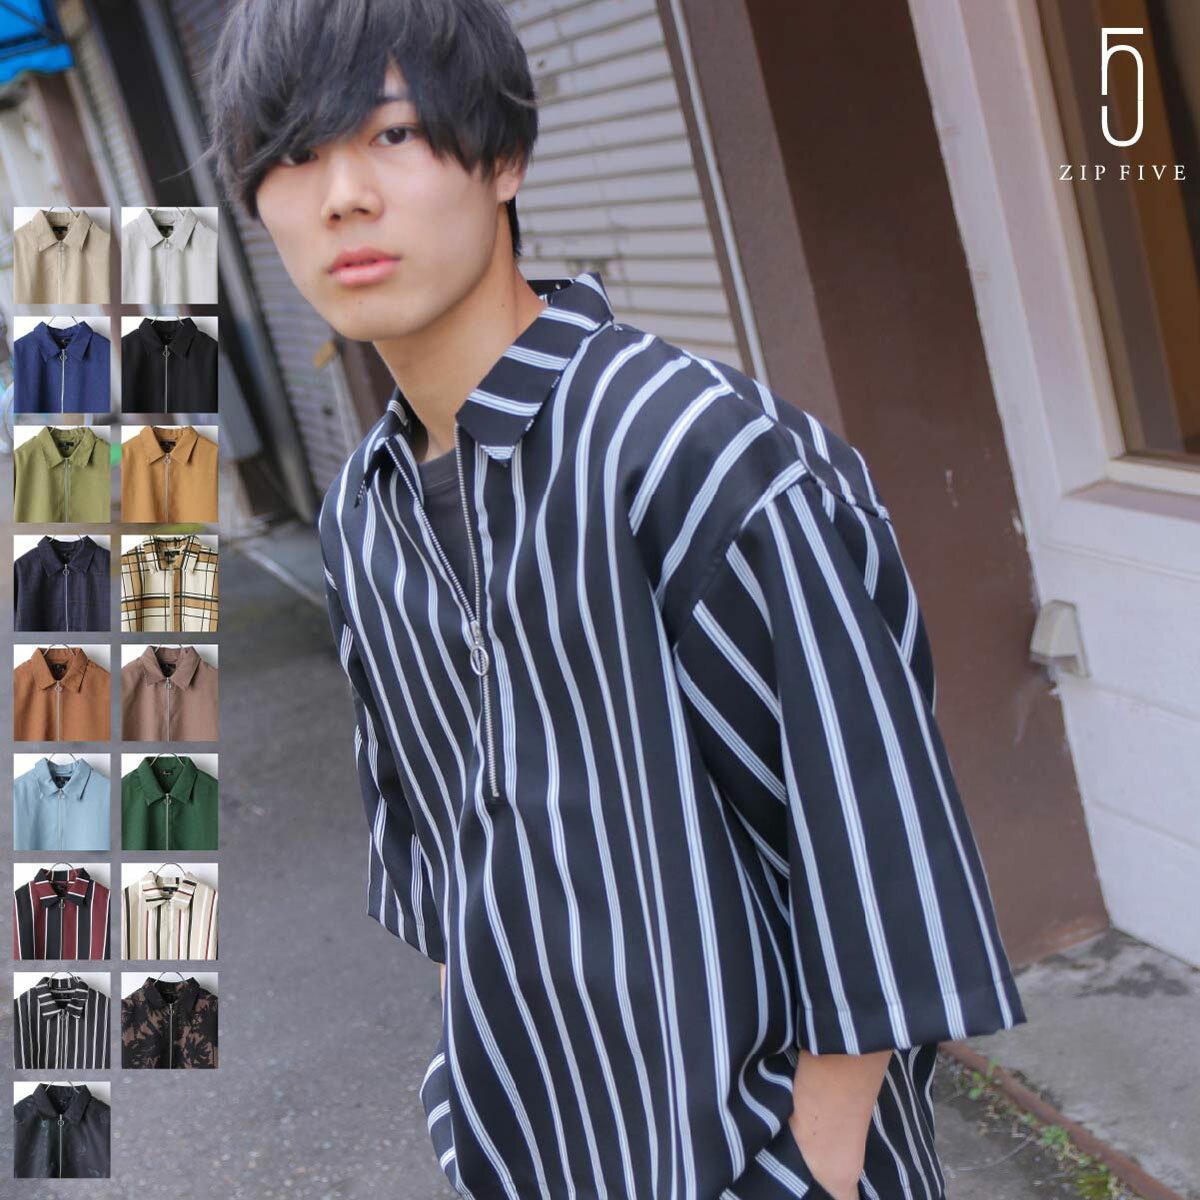 【ZIP】半拉鍊套頭衫 短袖 ZIP FIVE 襯衫 短袖 春裝 0